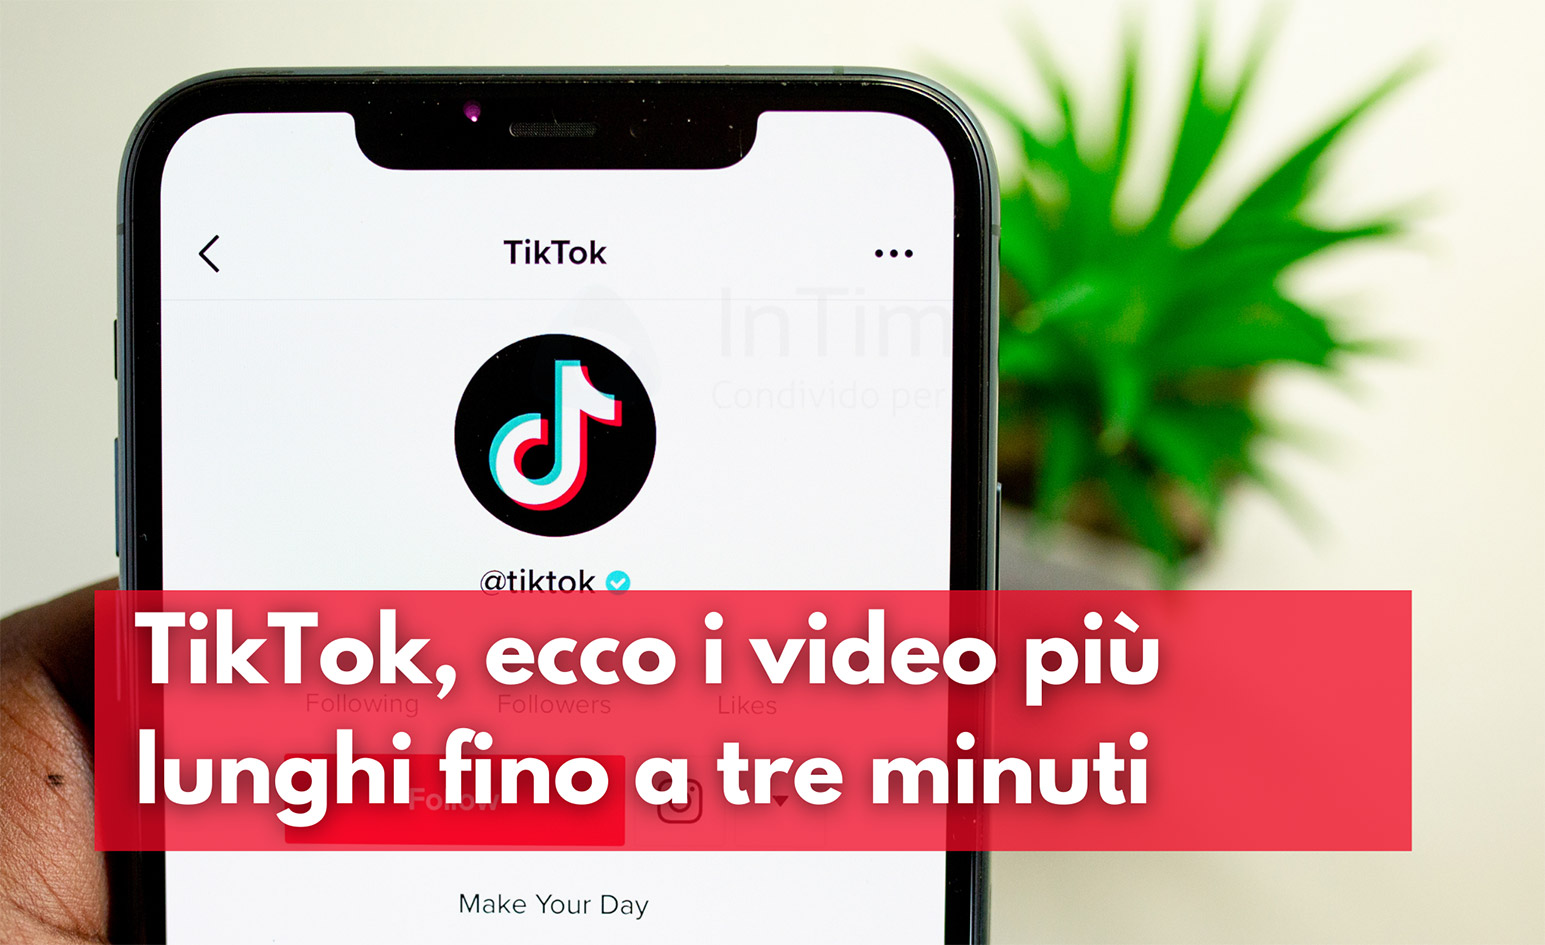 tiktok video lunghi 3 minuti franzrusso